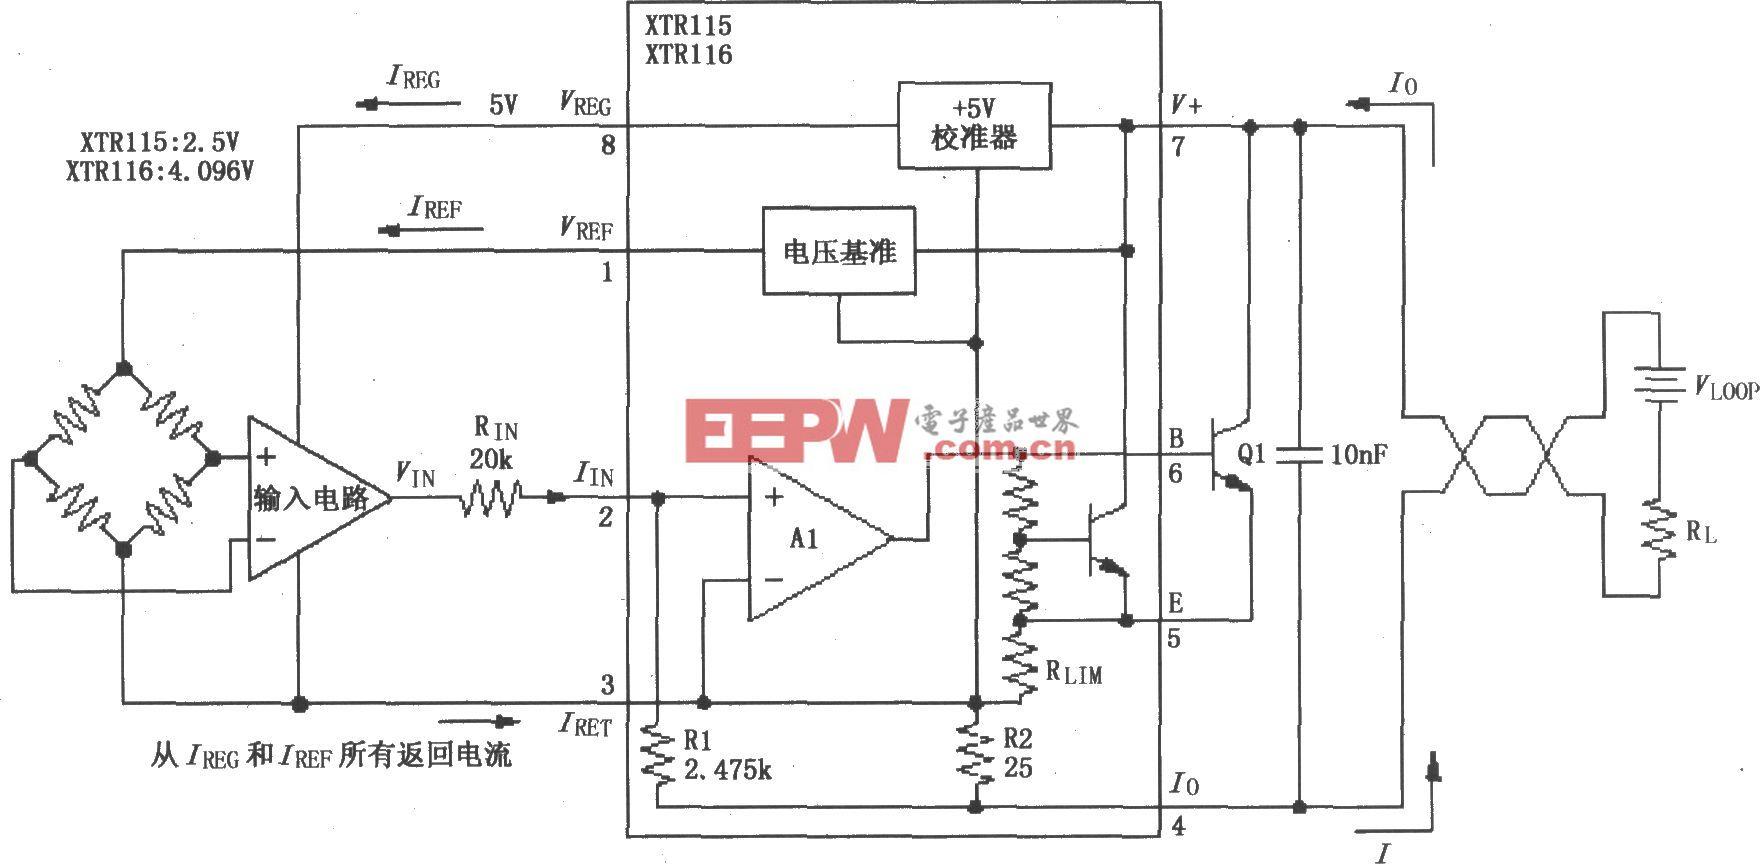 XTR115/116基本连接电路